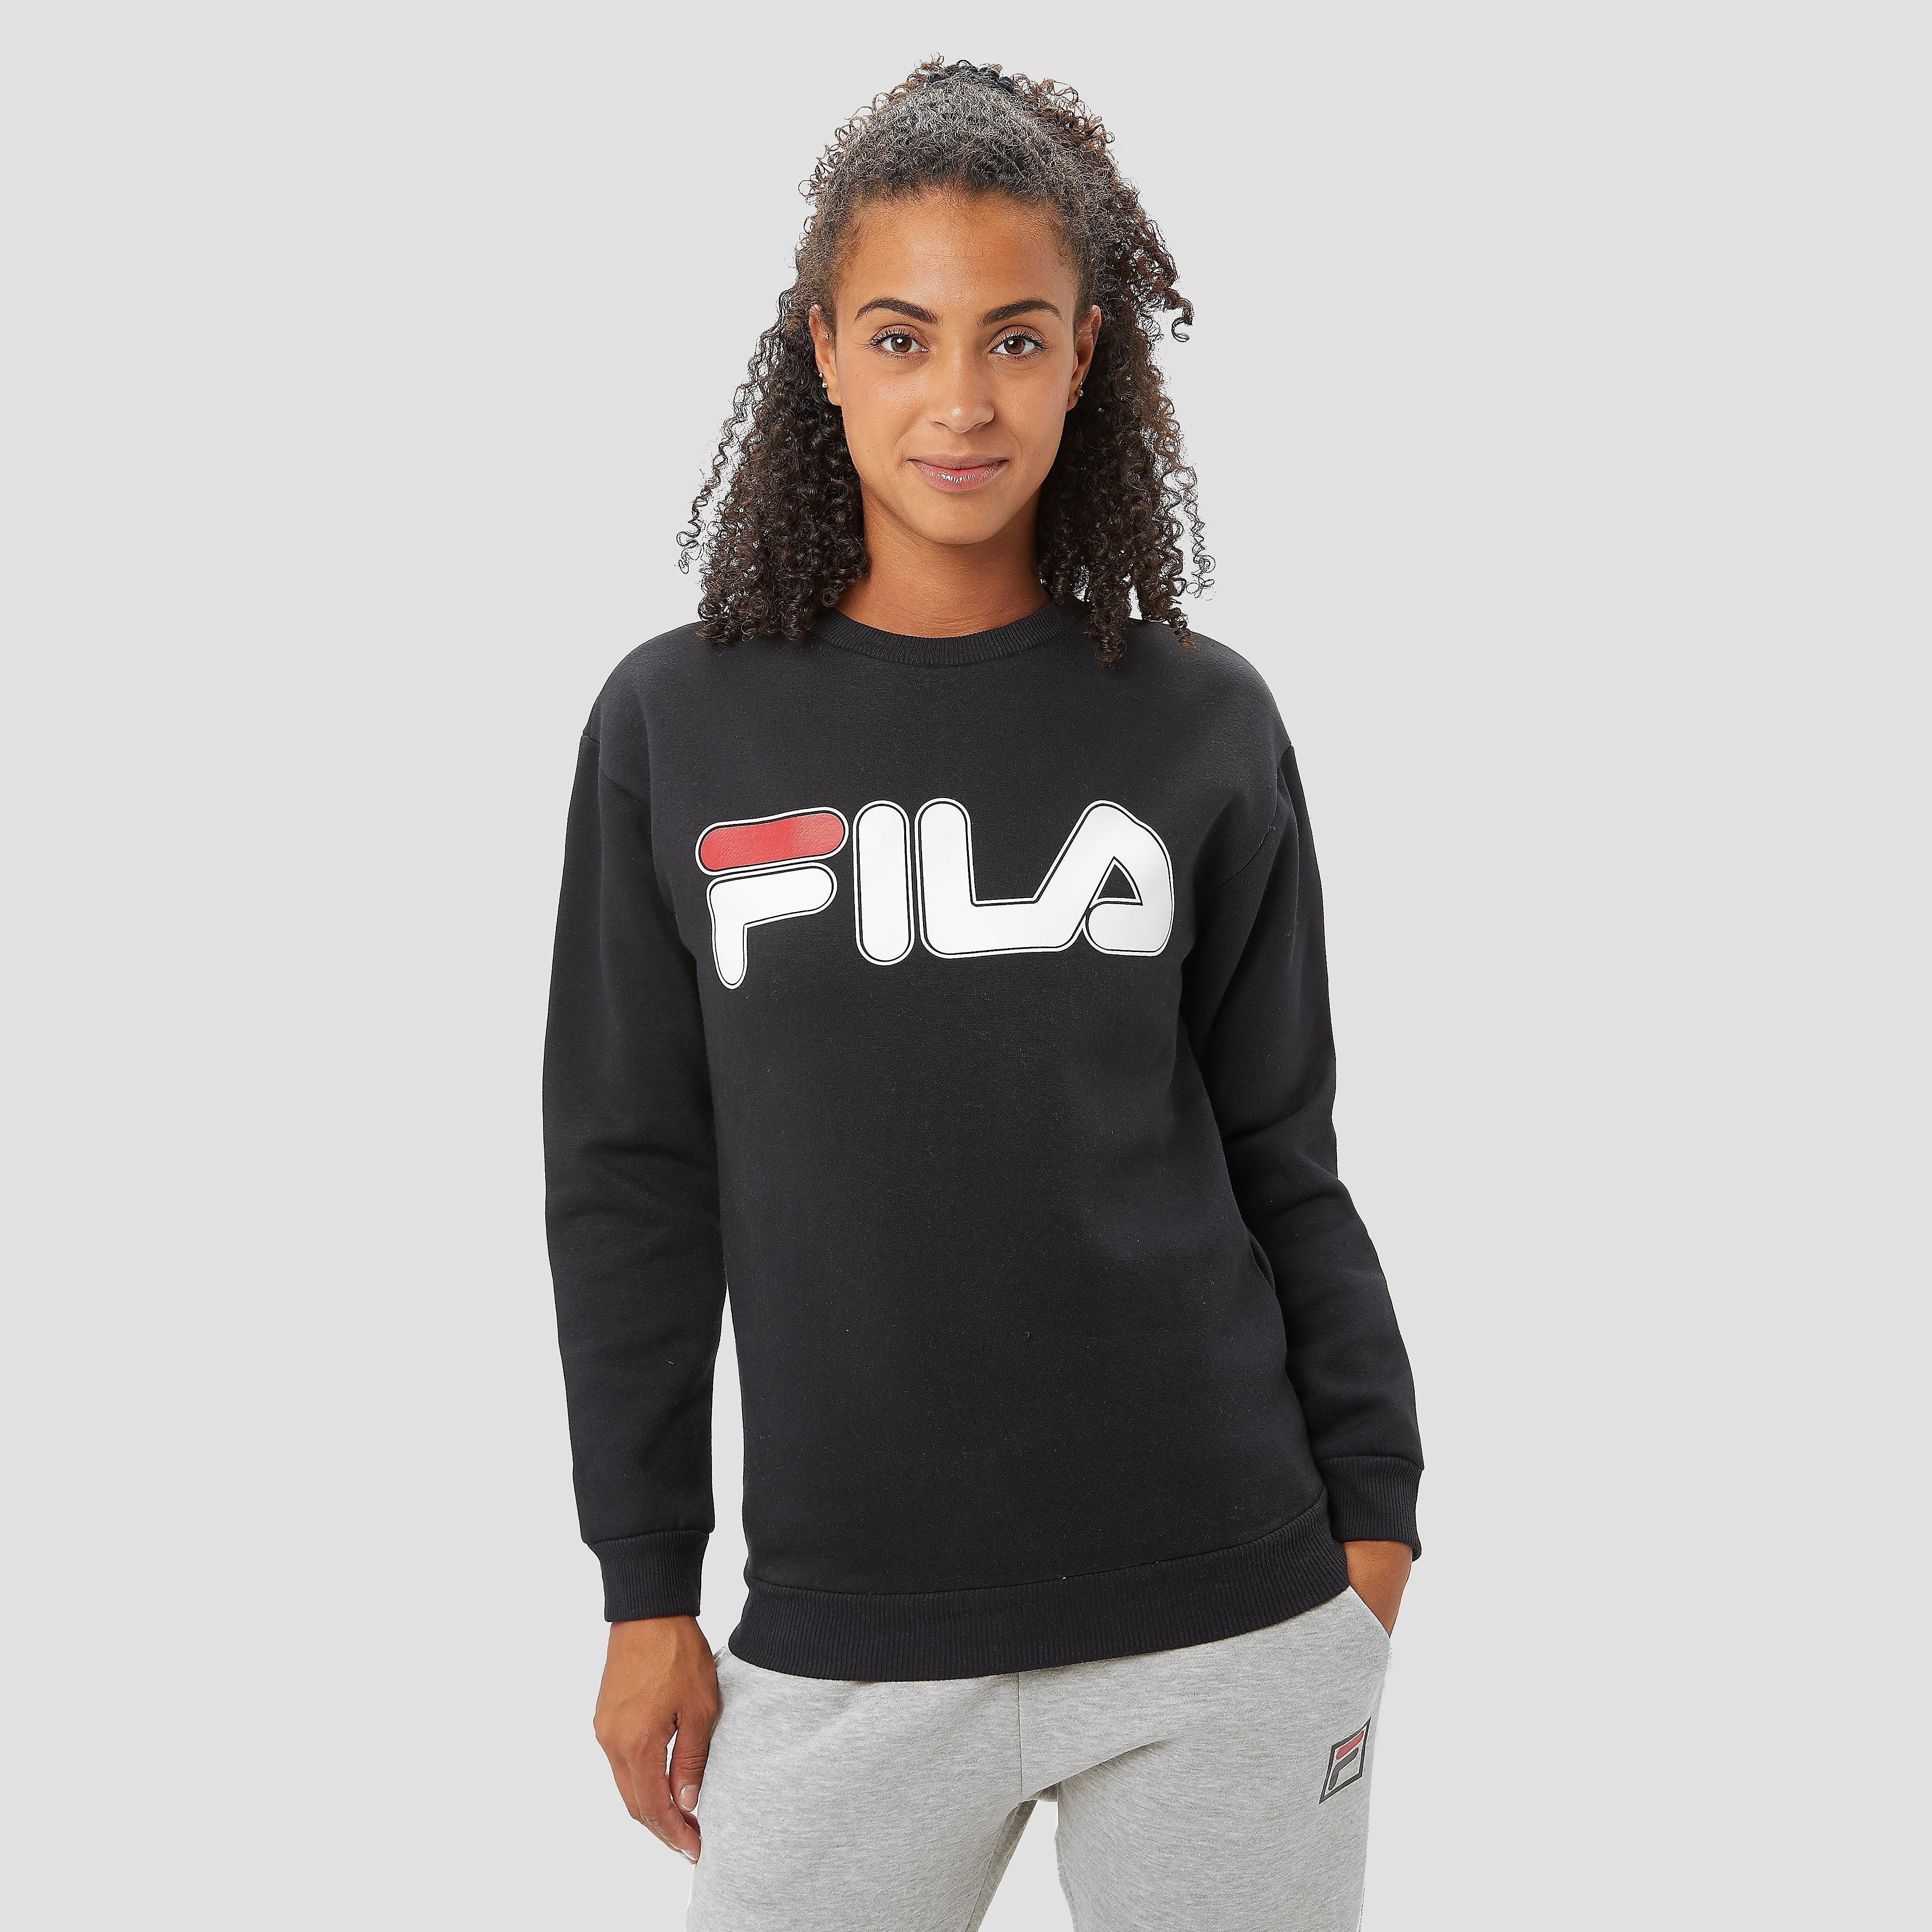 FILA CYDONIA 2 CREW SWEATER WIT DAMES